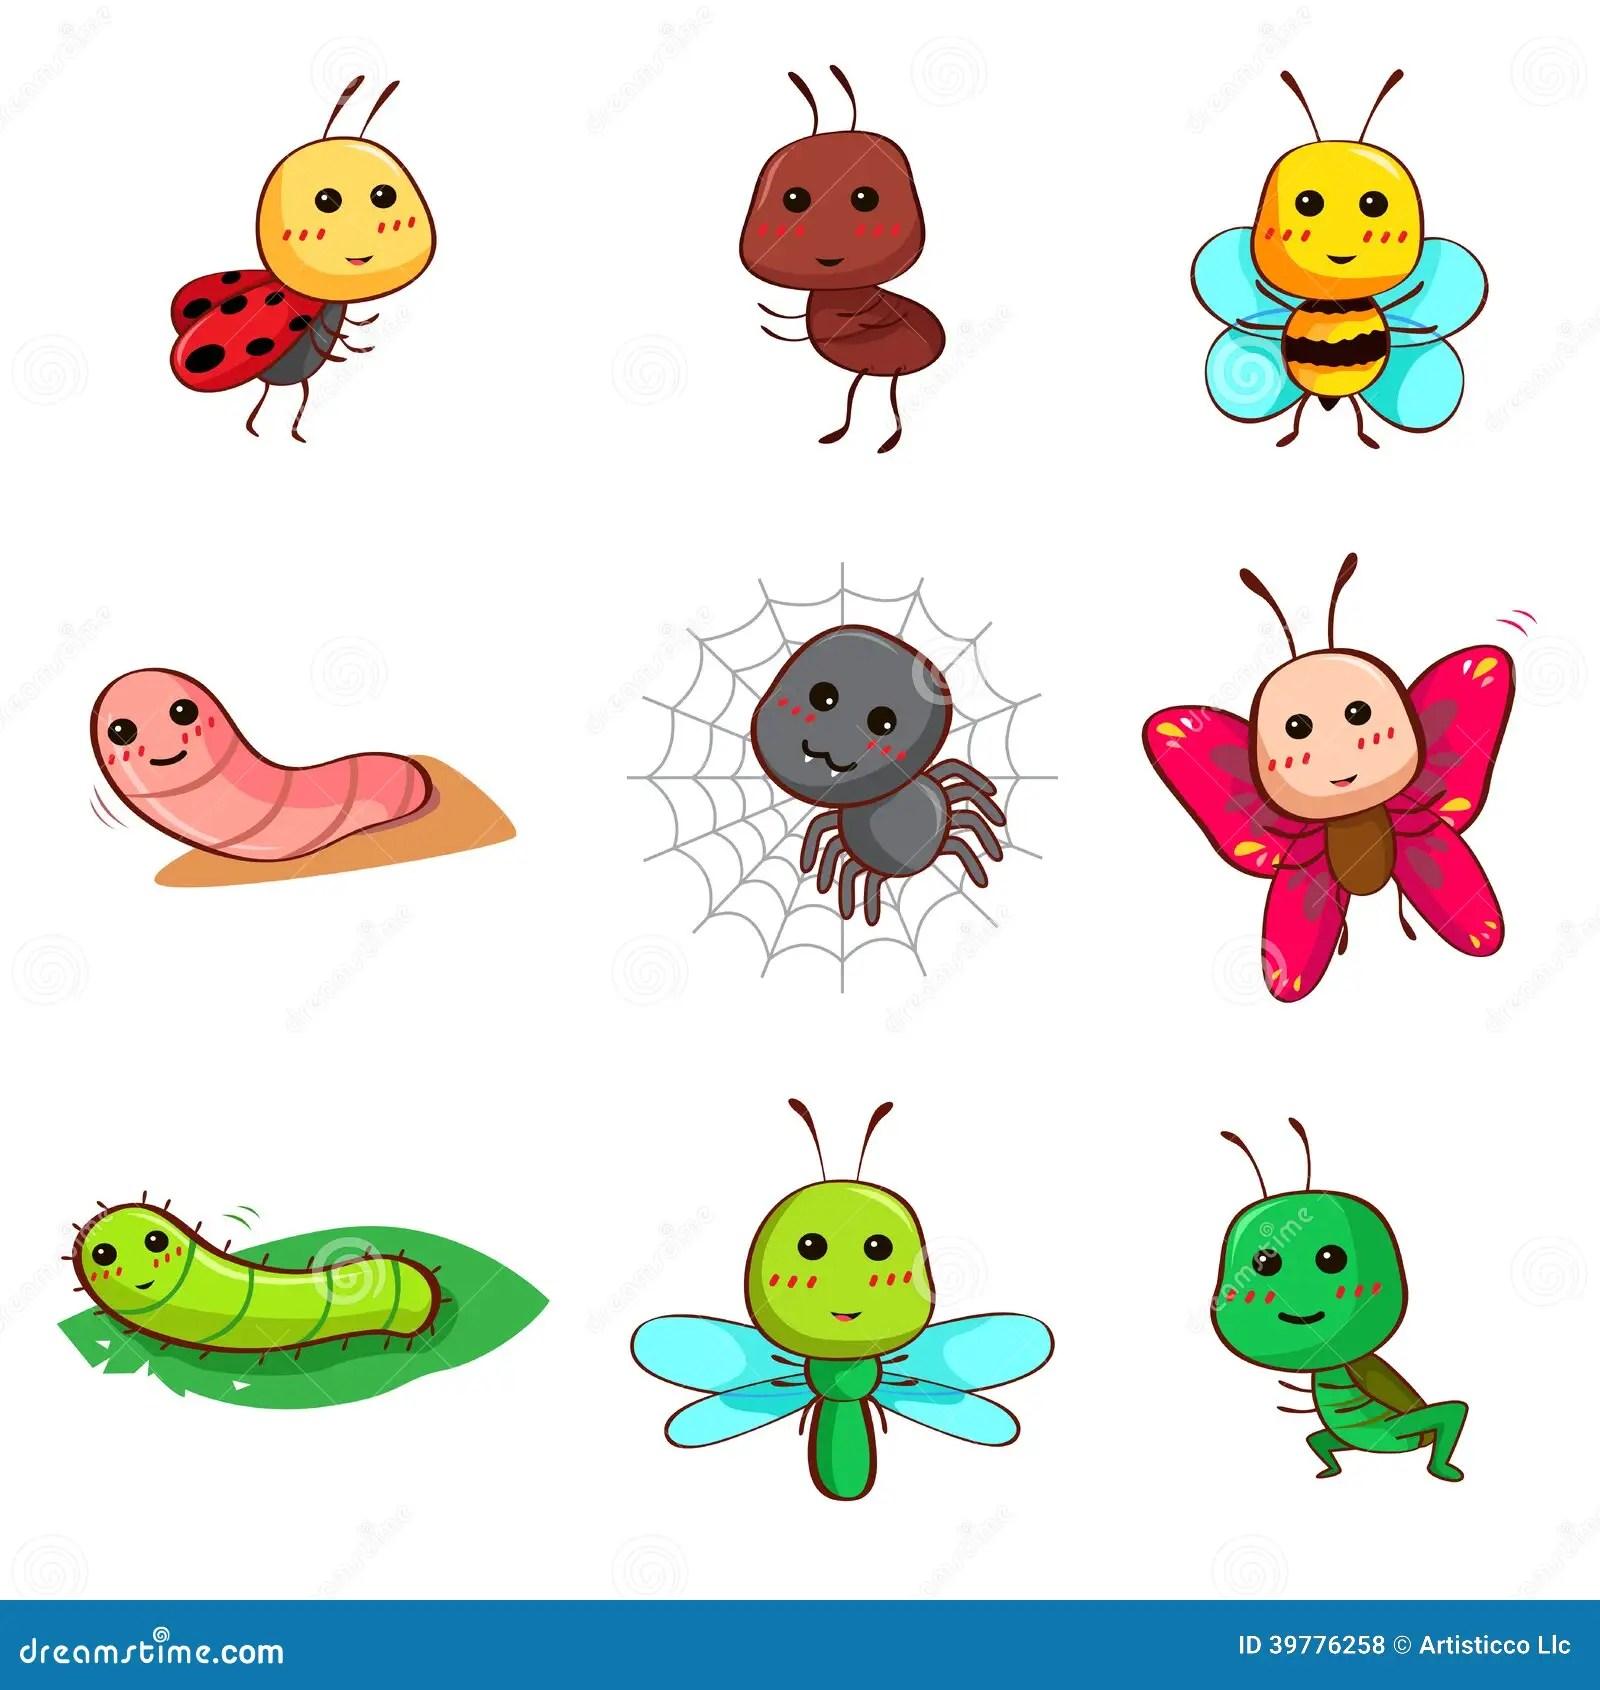 Worksheet For Preschoolers Bugs Bees Butterflies